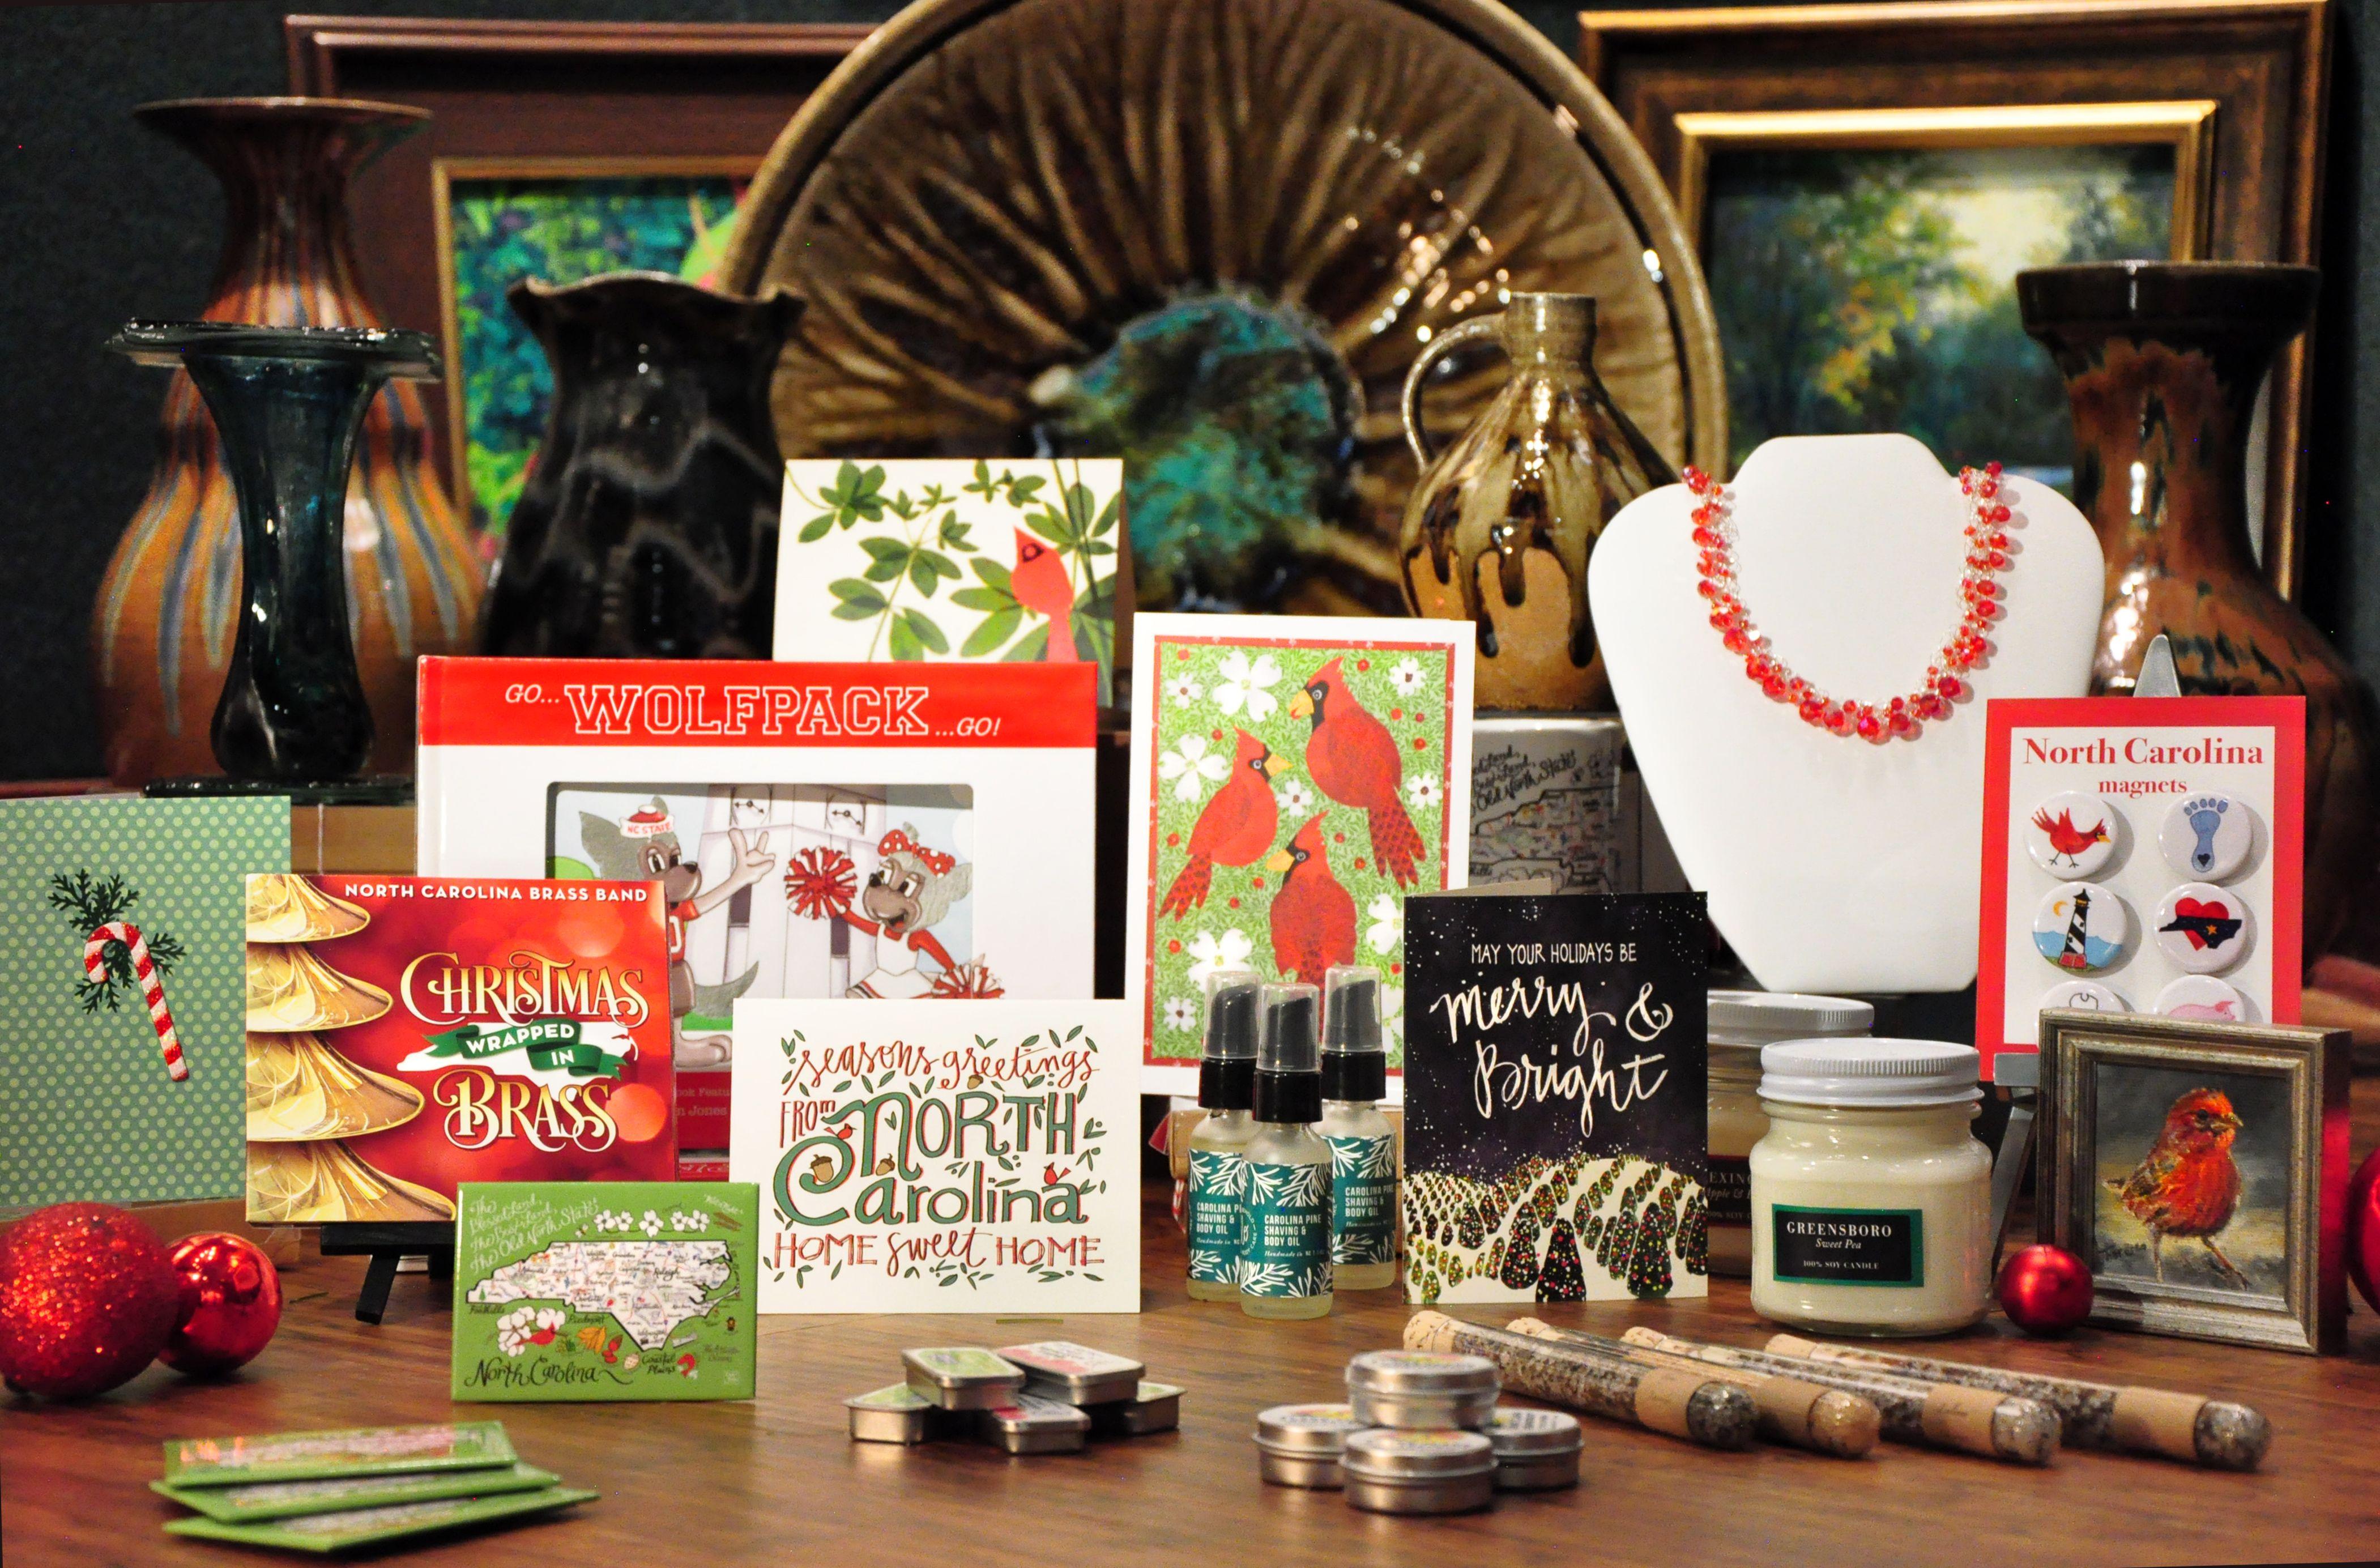 North carolina fine art gifts great holiday gifts made